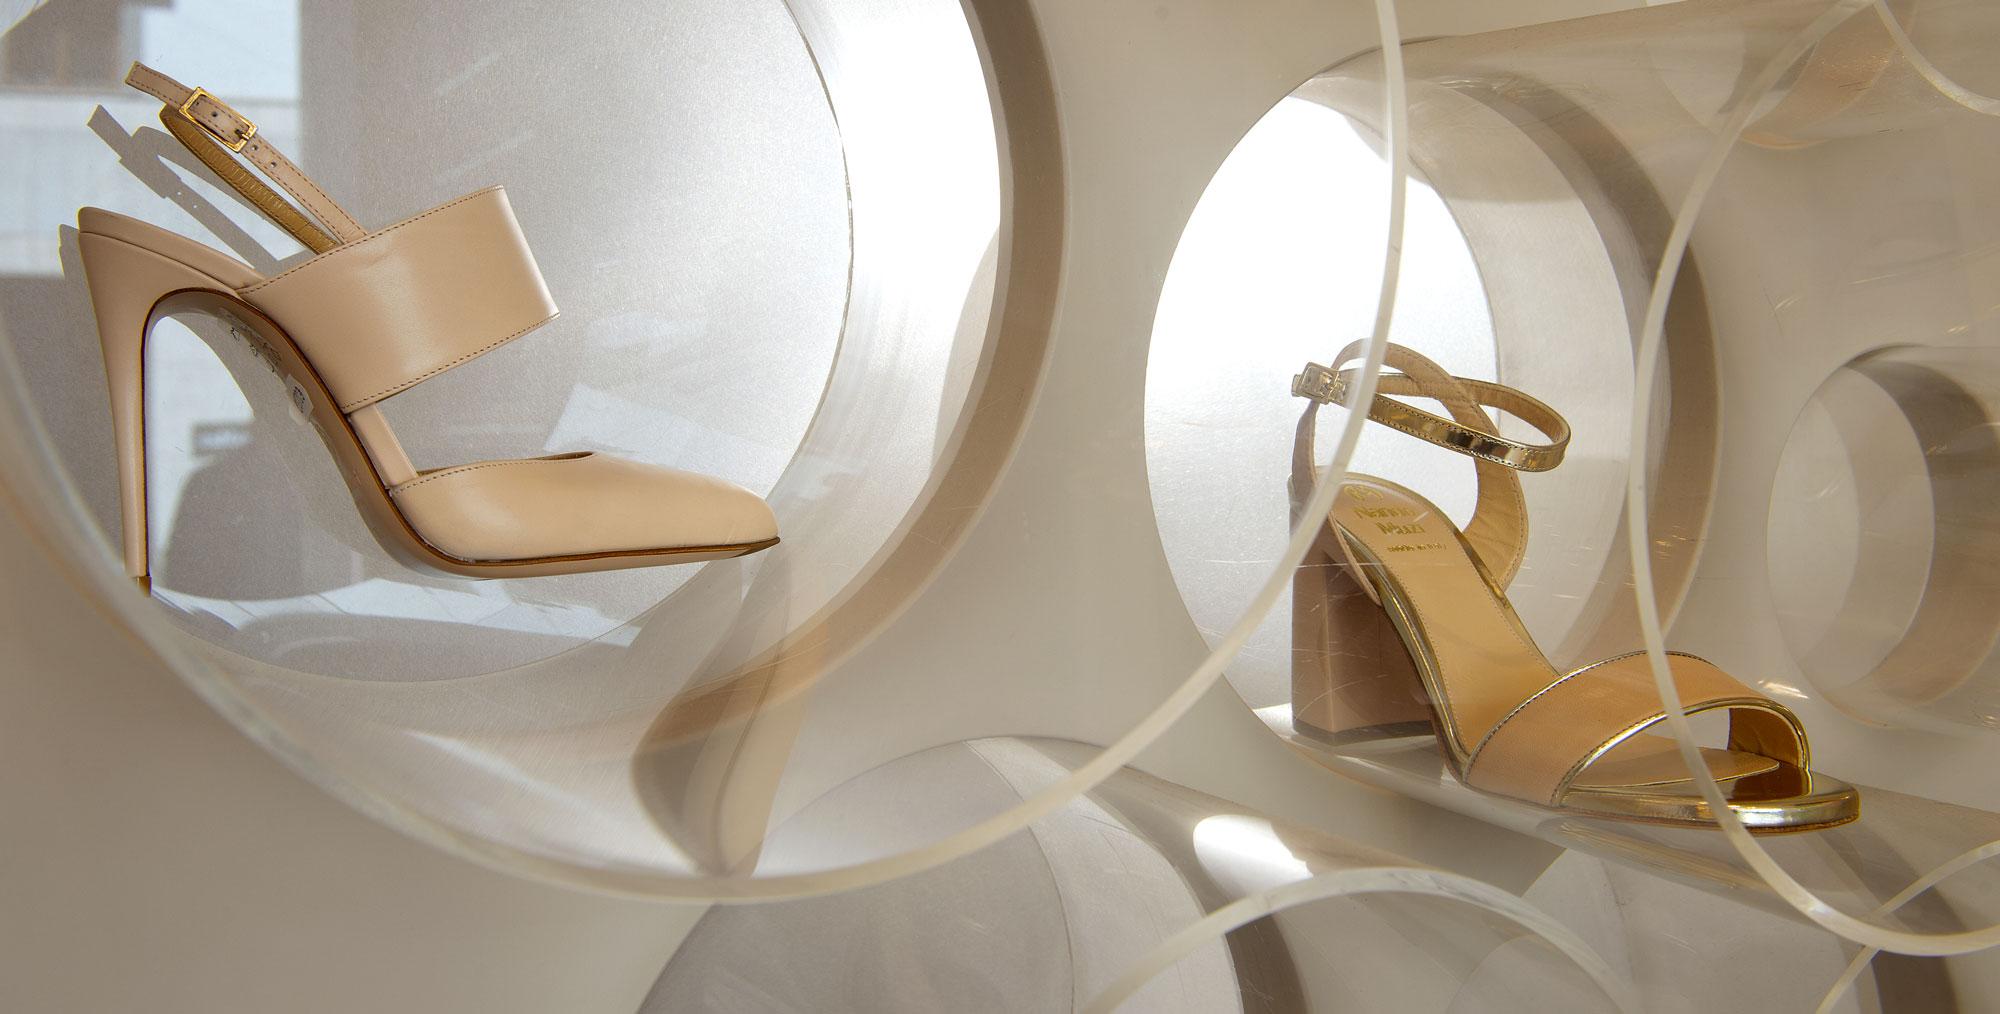 Negozio scarpe eleganti Milano